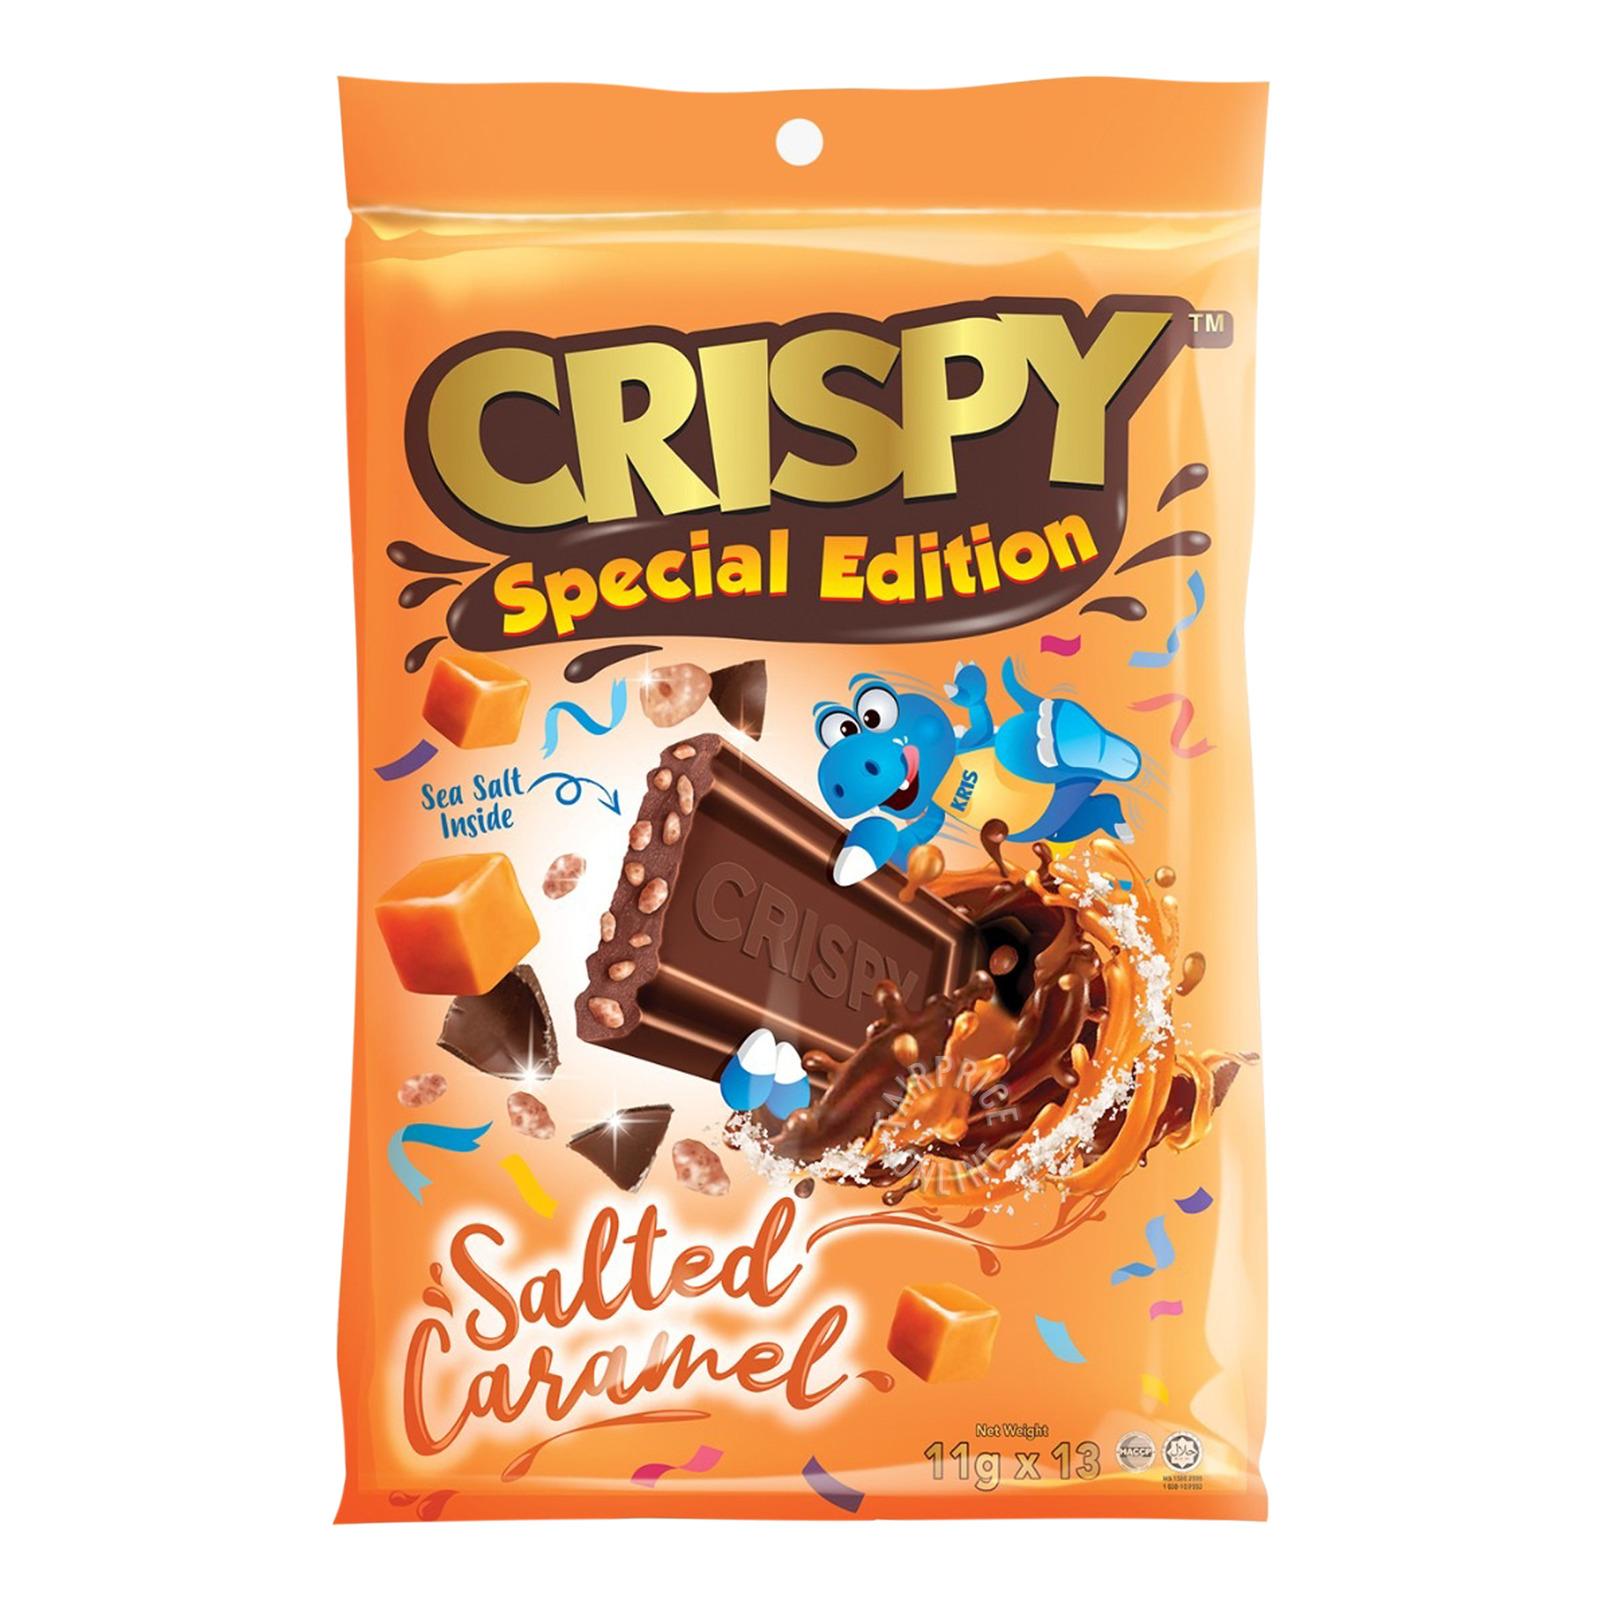 Crispy Chocolatey Rice Cereal - Sea Salt Caramel